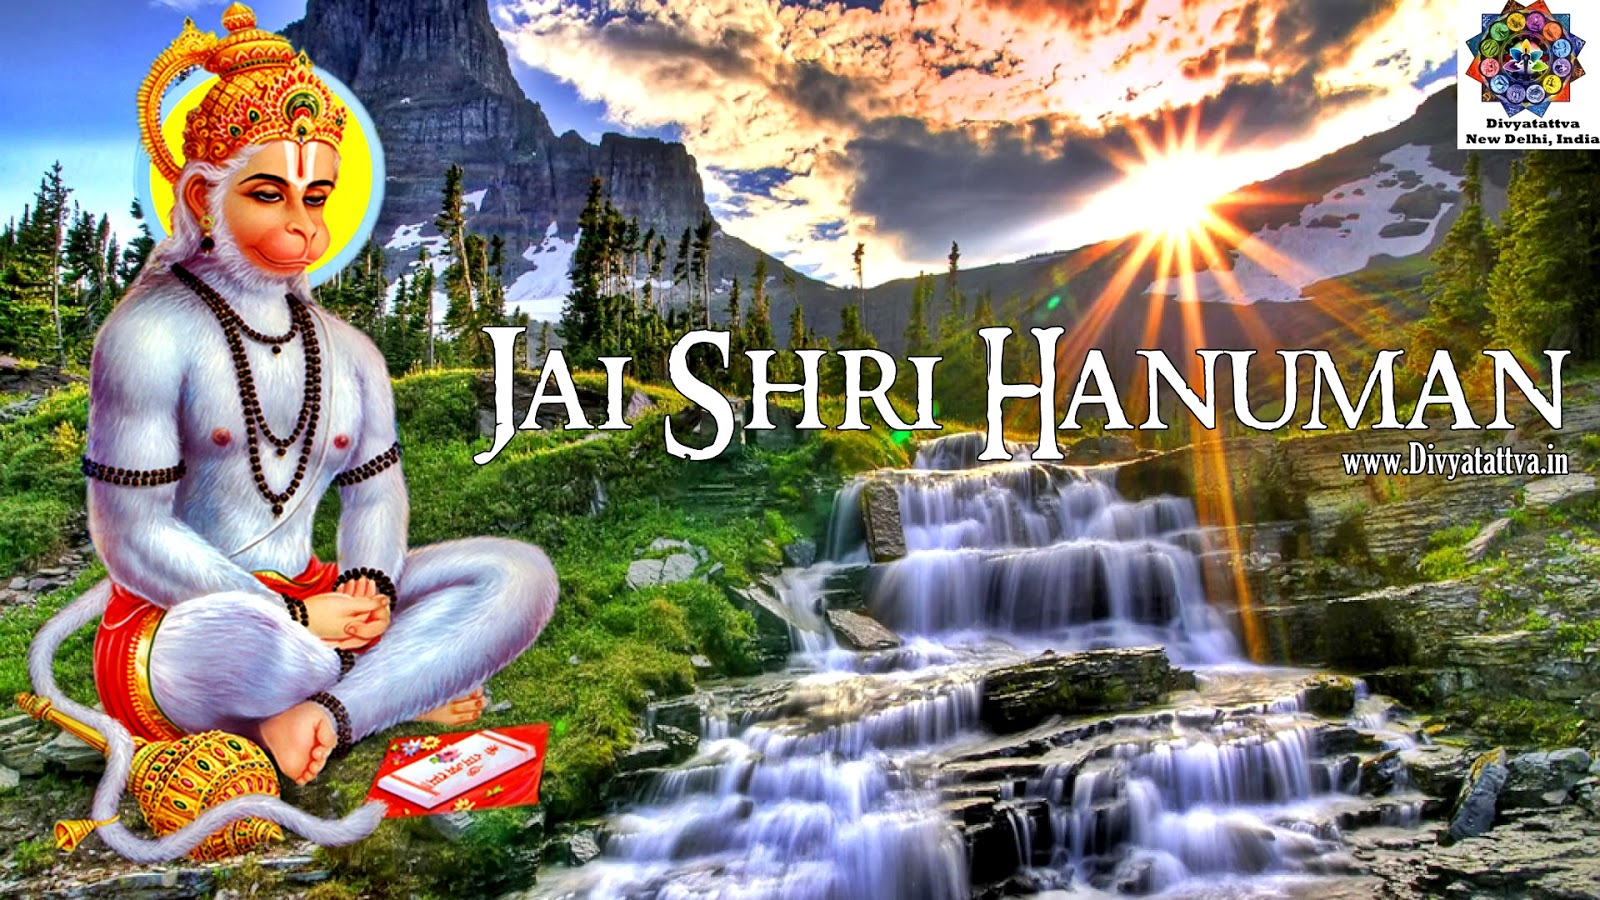 divyatattva astrology free horoscopes psychic tarot yoga tantra occult images videos hindu god hanuman hd wallpaper hanuman 4k hd wallpaper 1080p 1920x1080 hindu god hanuman hd wallpaper hanuman